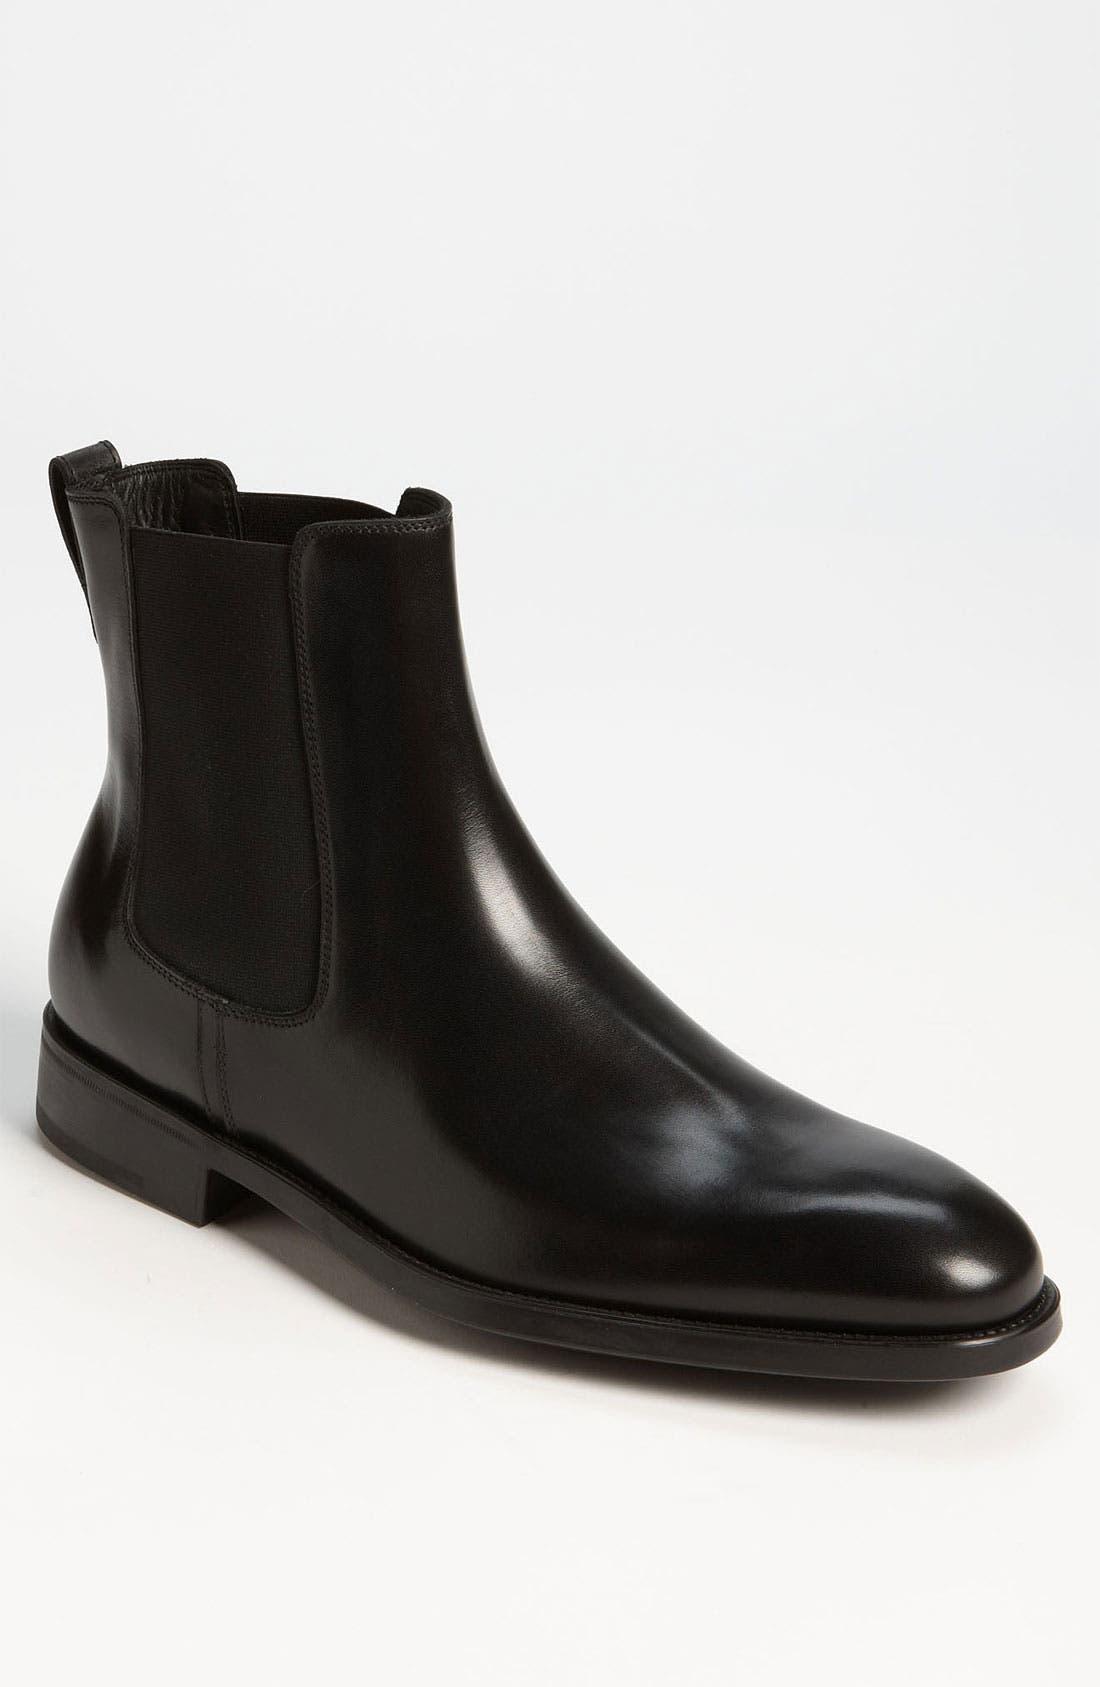 Main Image - Salvatore Ferragamo 'Arden' Chelsea Boot (Online Only)